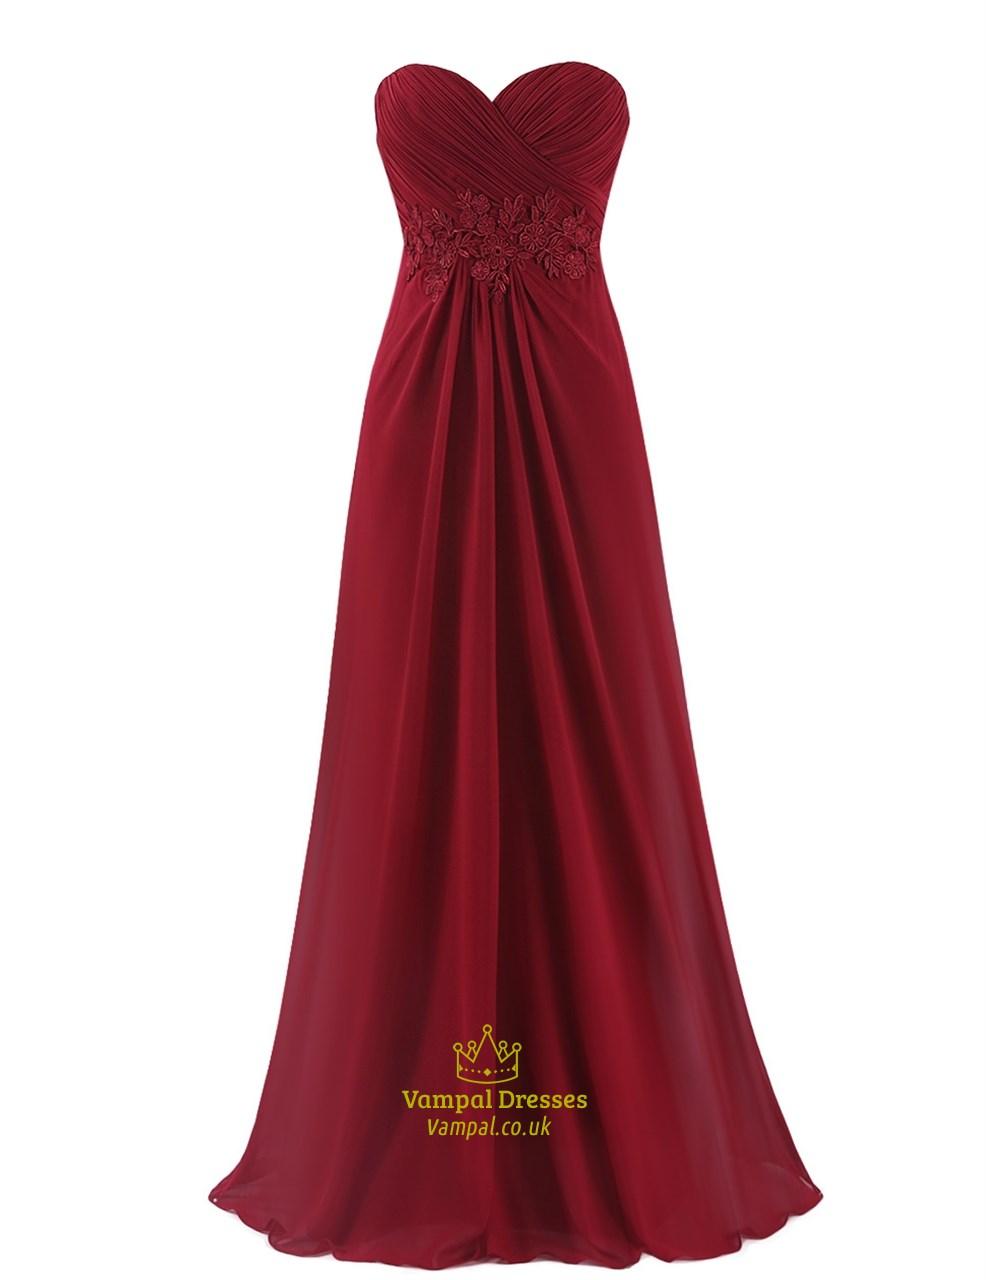 Burgundy Elegant Floor Length Chiffon Prom Dress With Lace